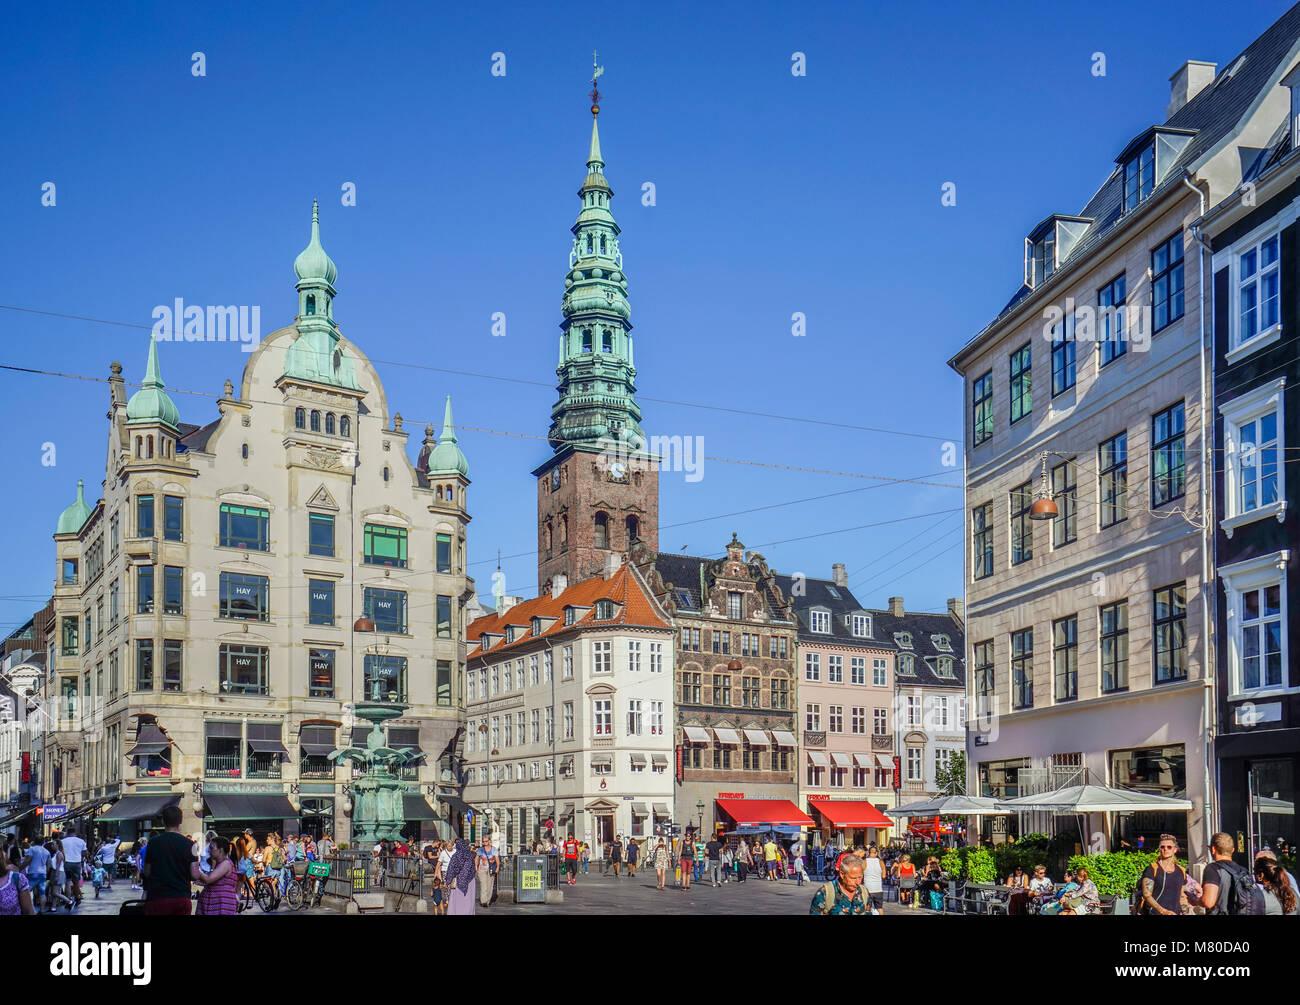 Denmark, Zealand, Copenhagen, view of Amanger Square in the heart of Copenhagen - Stock Image